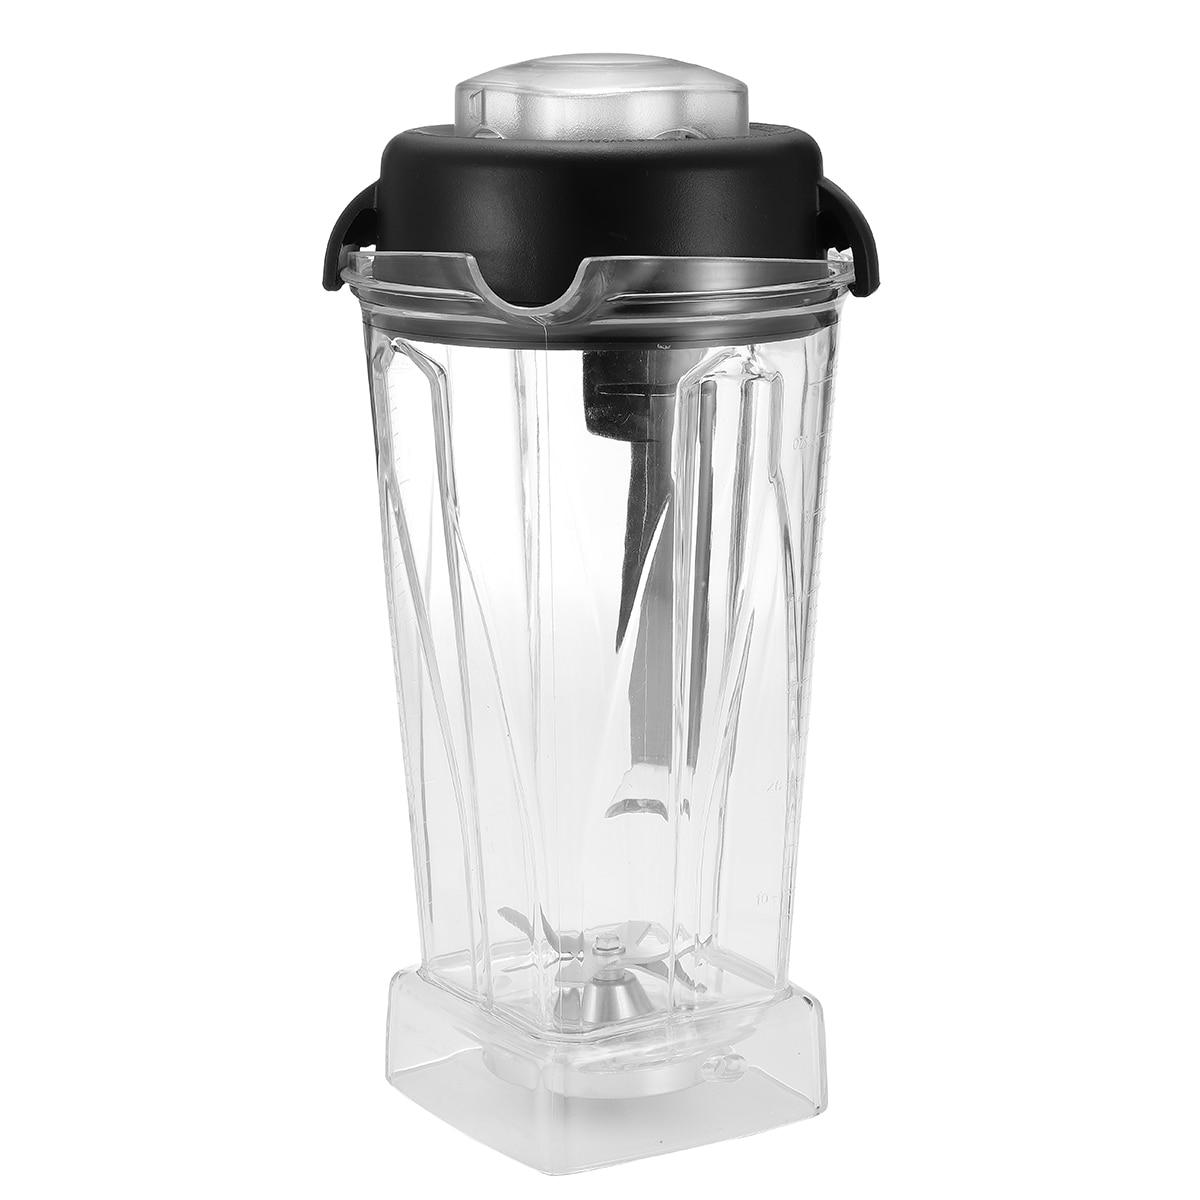 Countertop Blenders Home Garden Juicer Blender Spare Parts 2l Container Jar Jug Pitcher Cup For Vitamix 60oz Topografiapv Cl